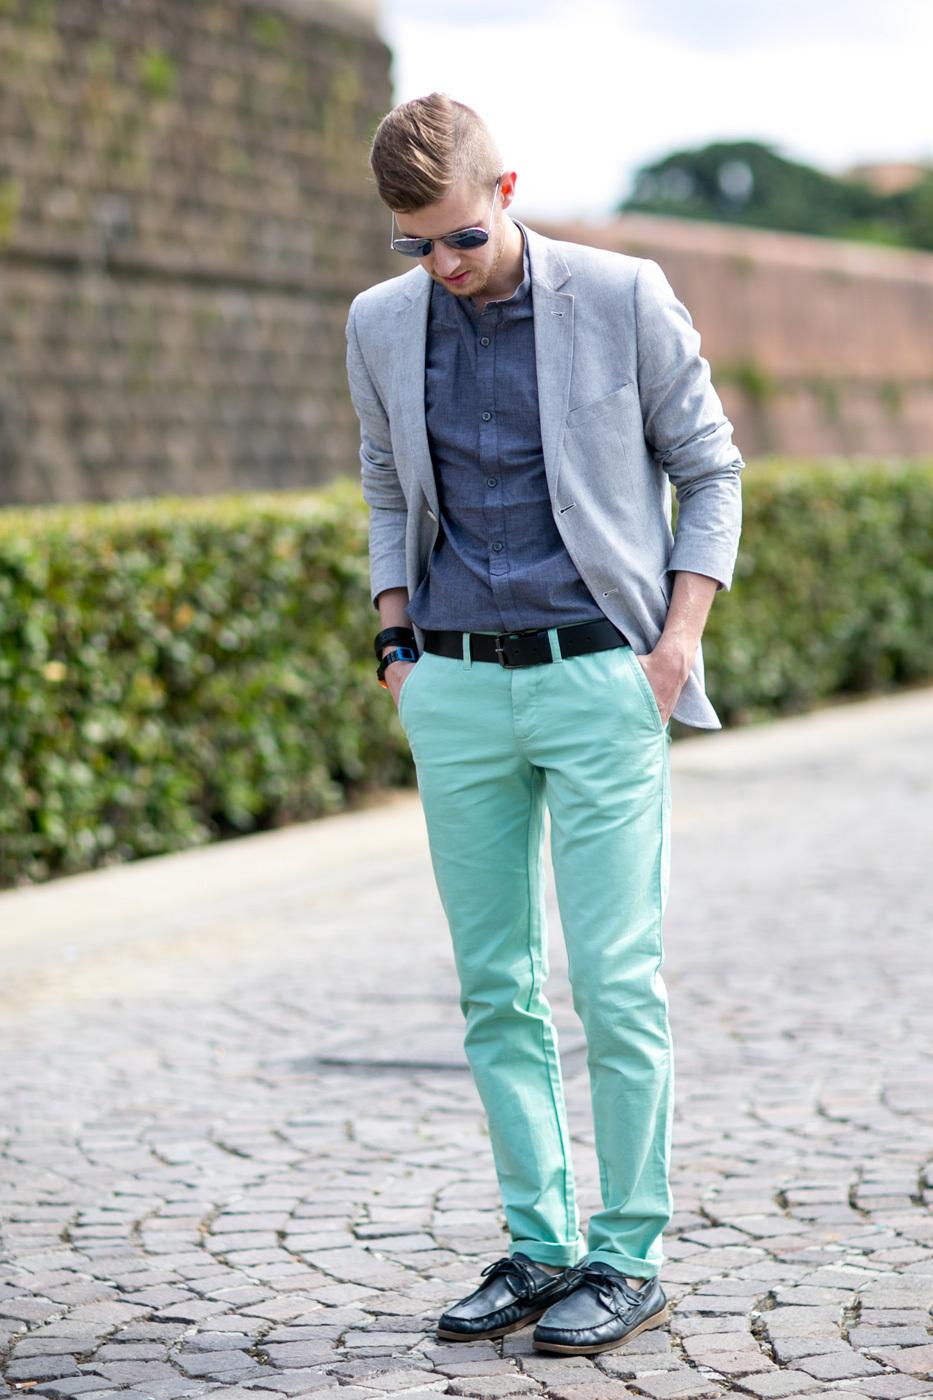 de combinar camisa manga larga Cómo azul chino gris de cambray blazer pantalón wxadqWt0f